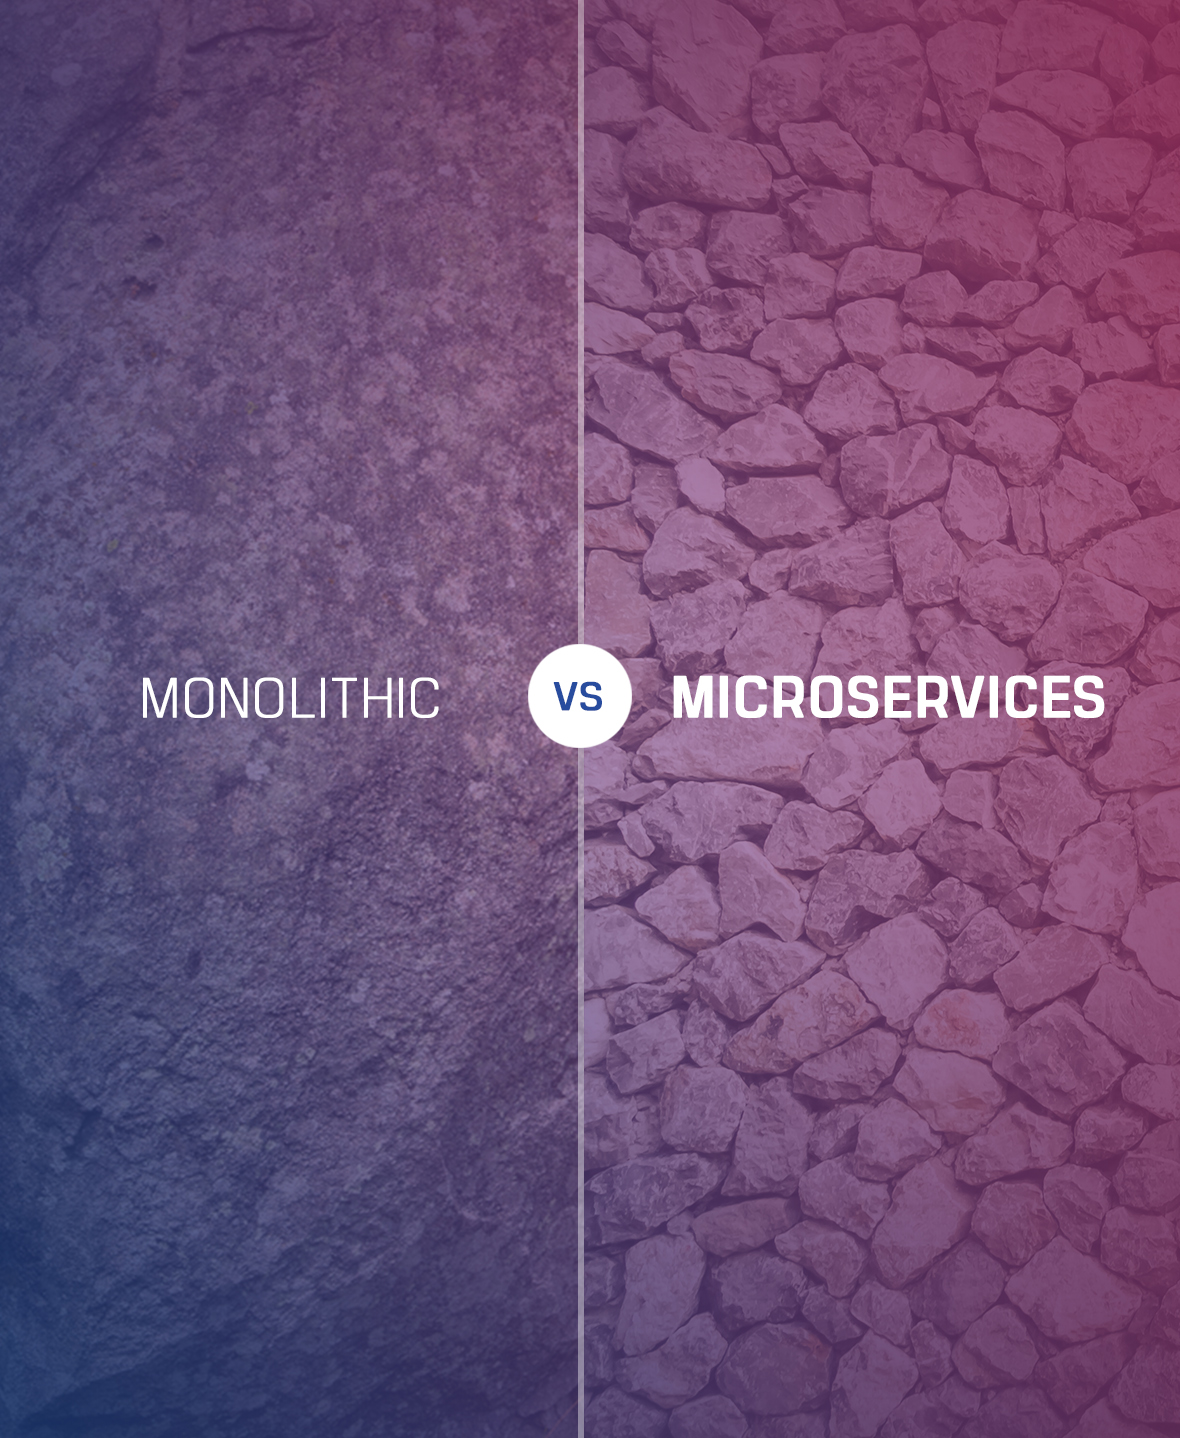 Monolithic vs Microservices